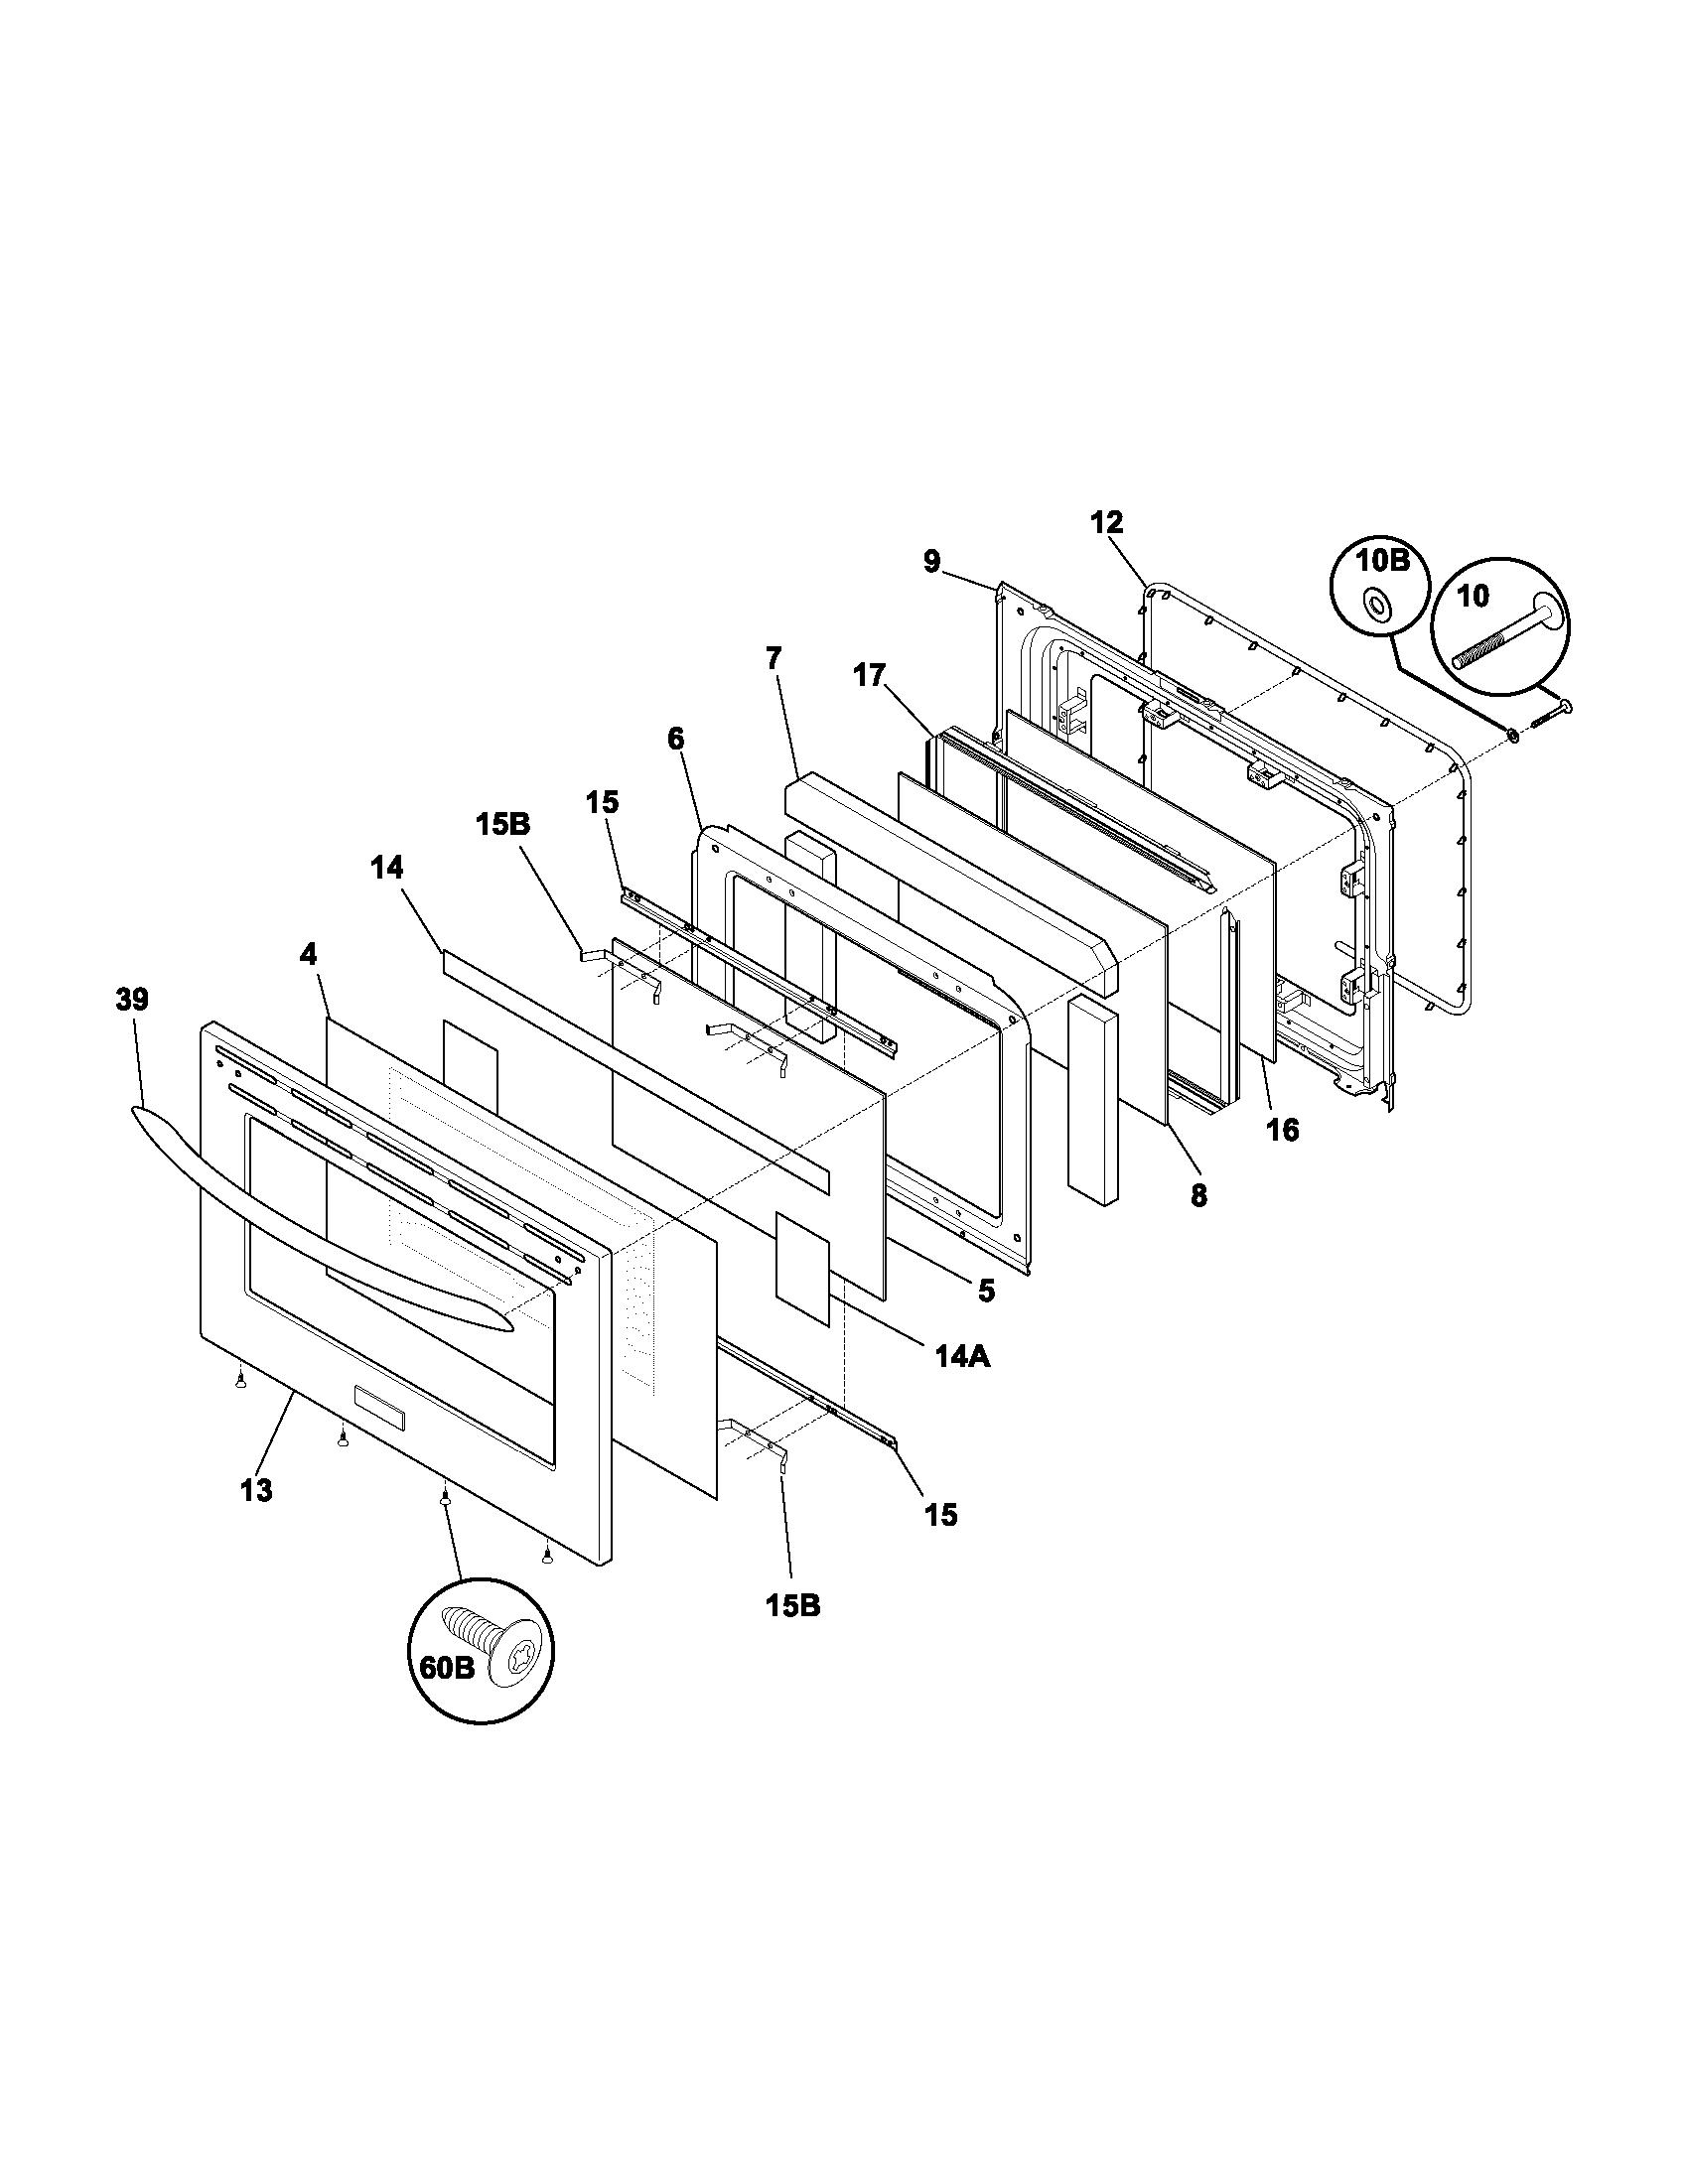 plef398ccc electric range door parts diagram wiring schematic parts diagram